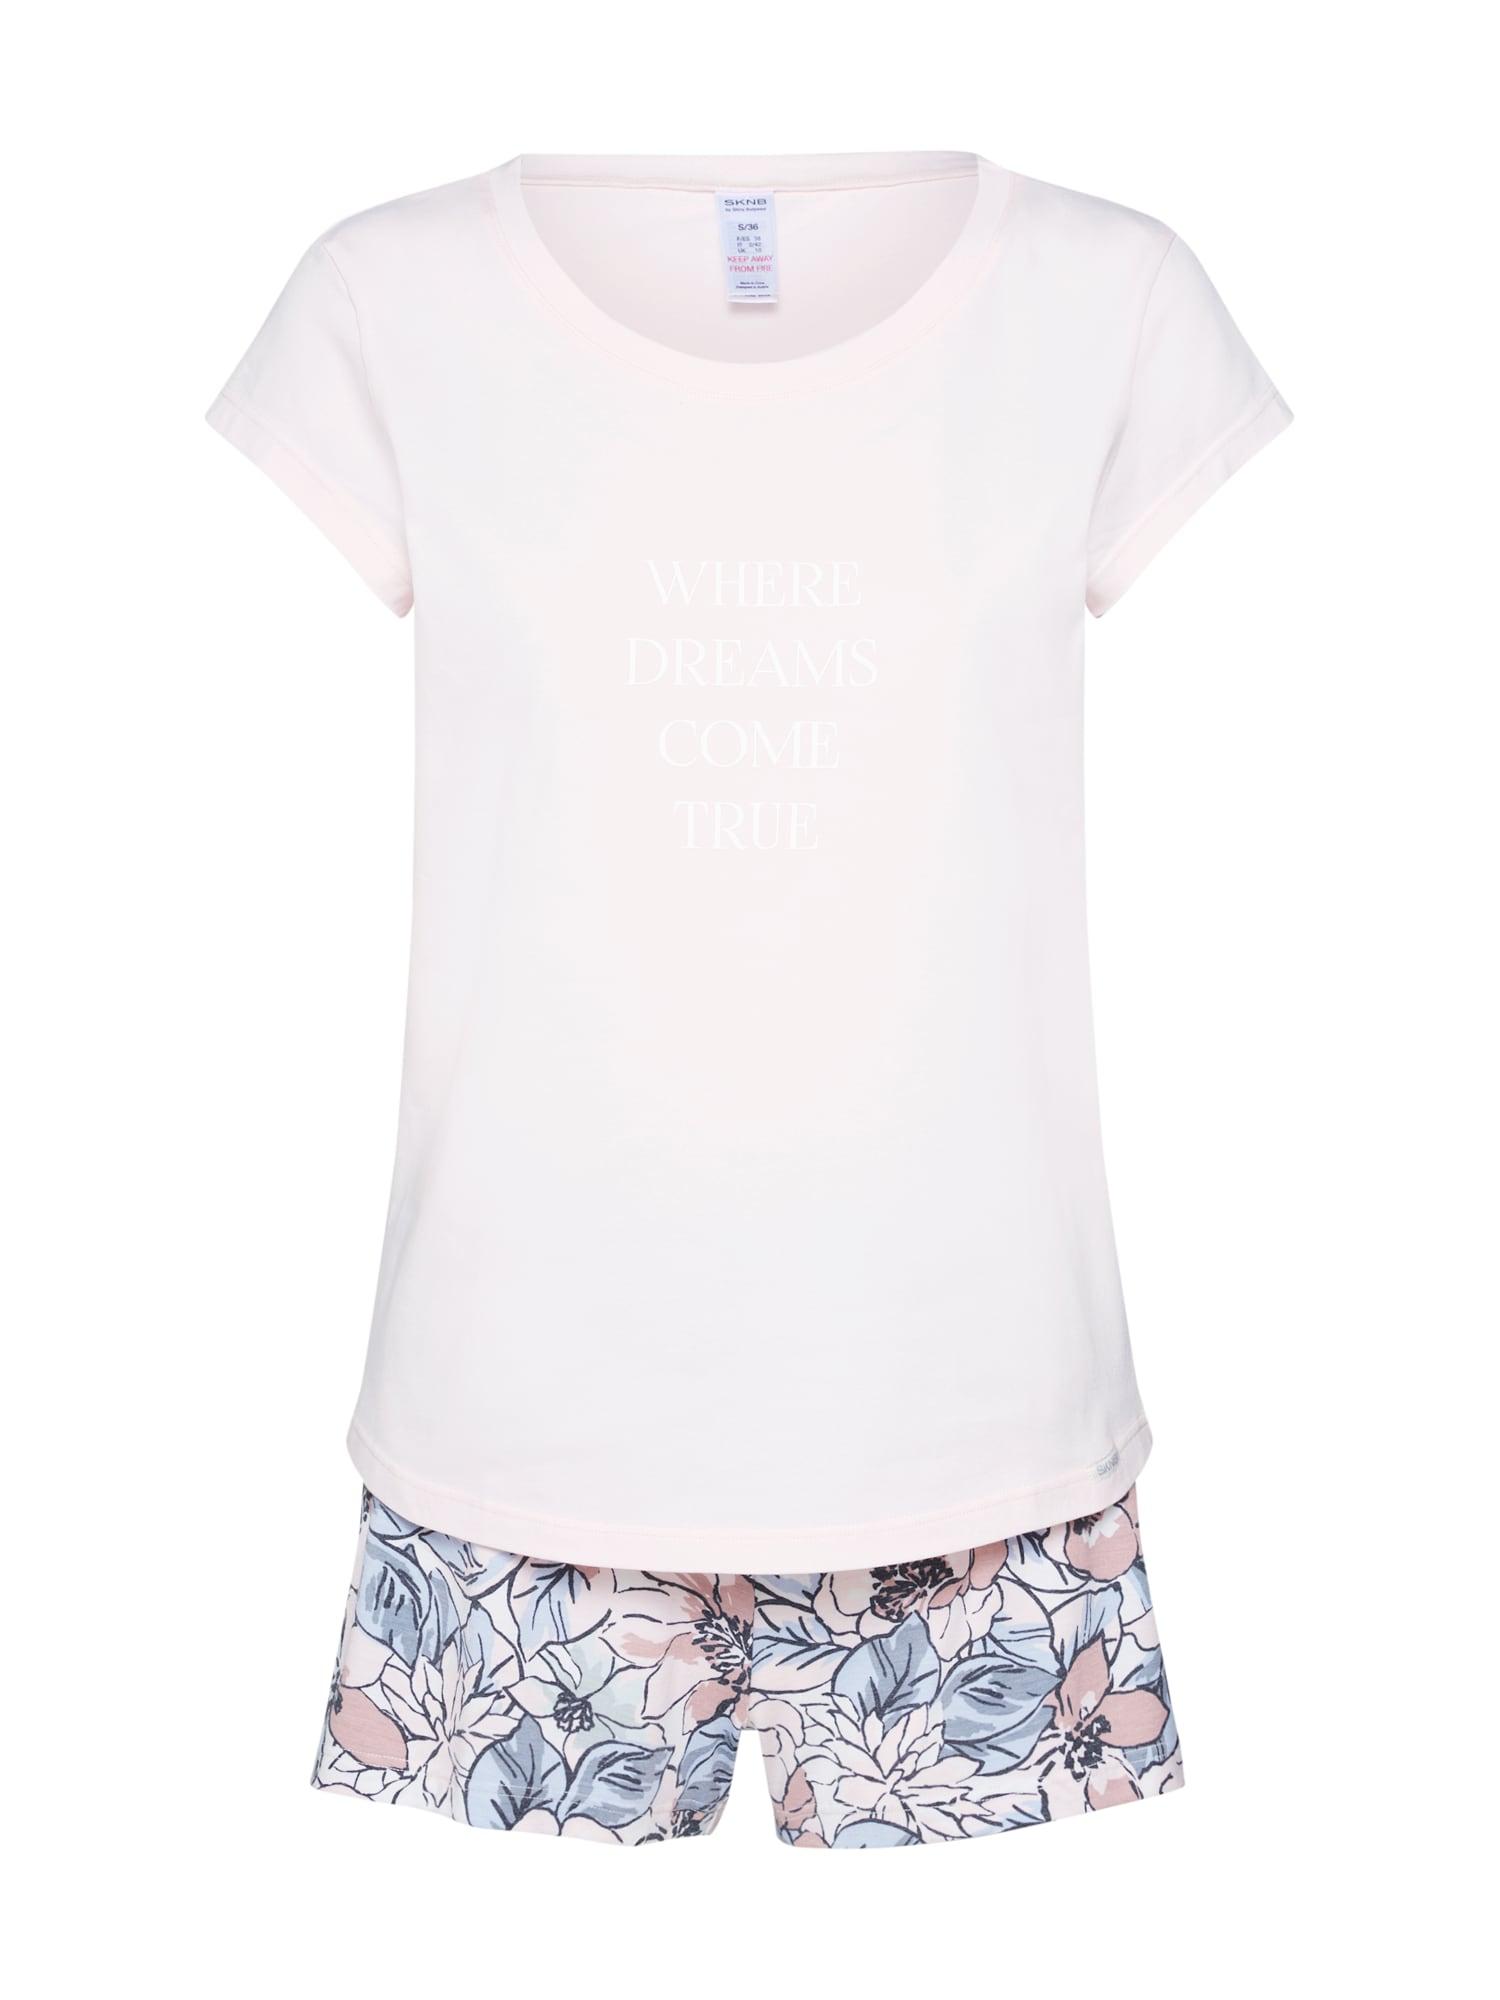 Pyžamo Nostalgic Summer Sleep mix barev růžová Skiny